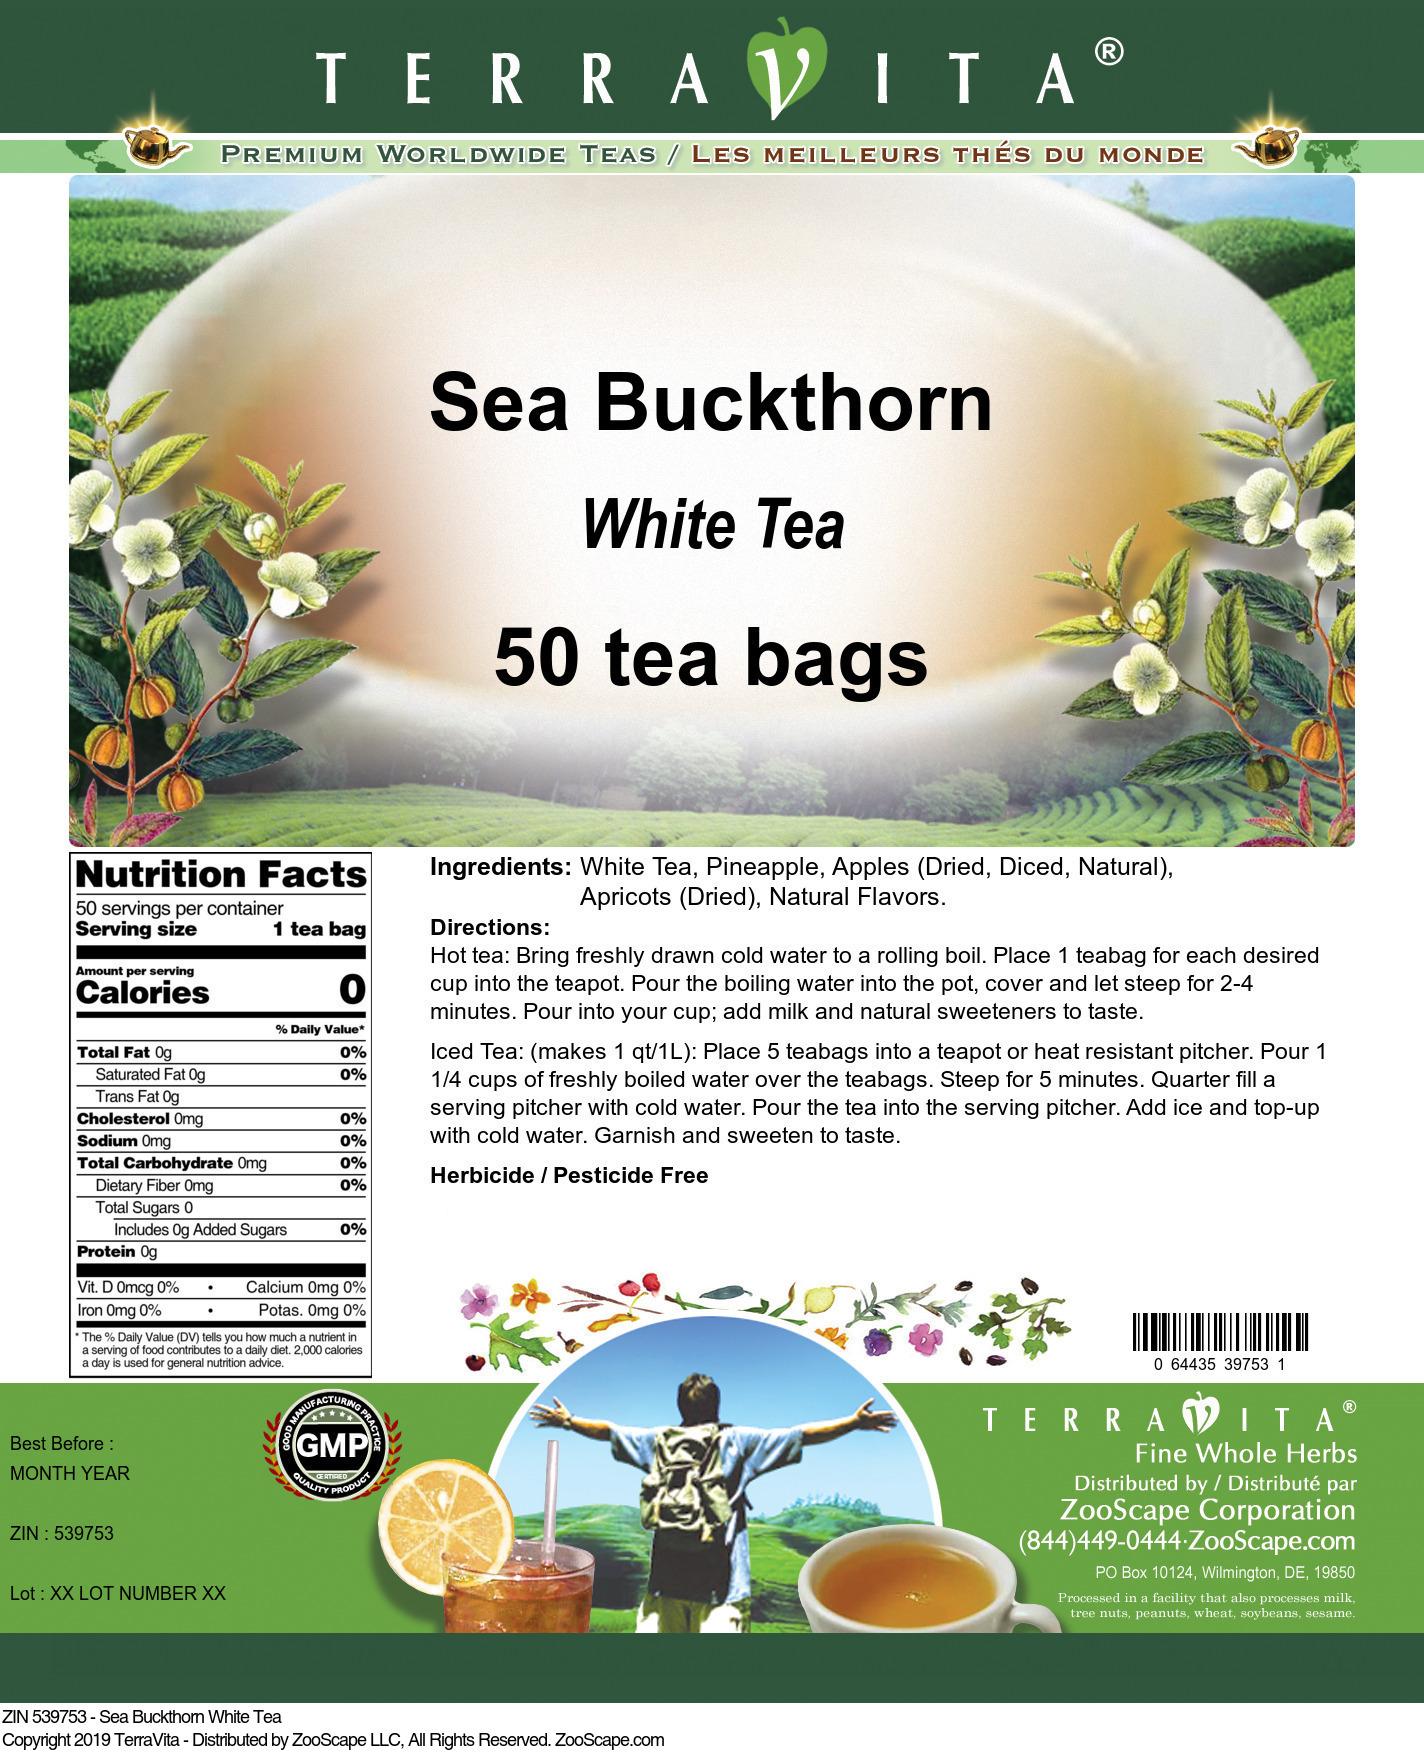 Sea Buckthorn White Tea